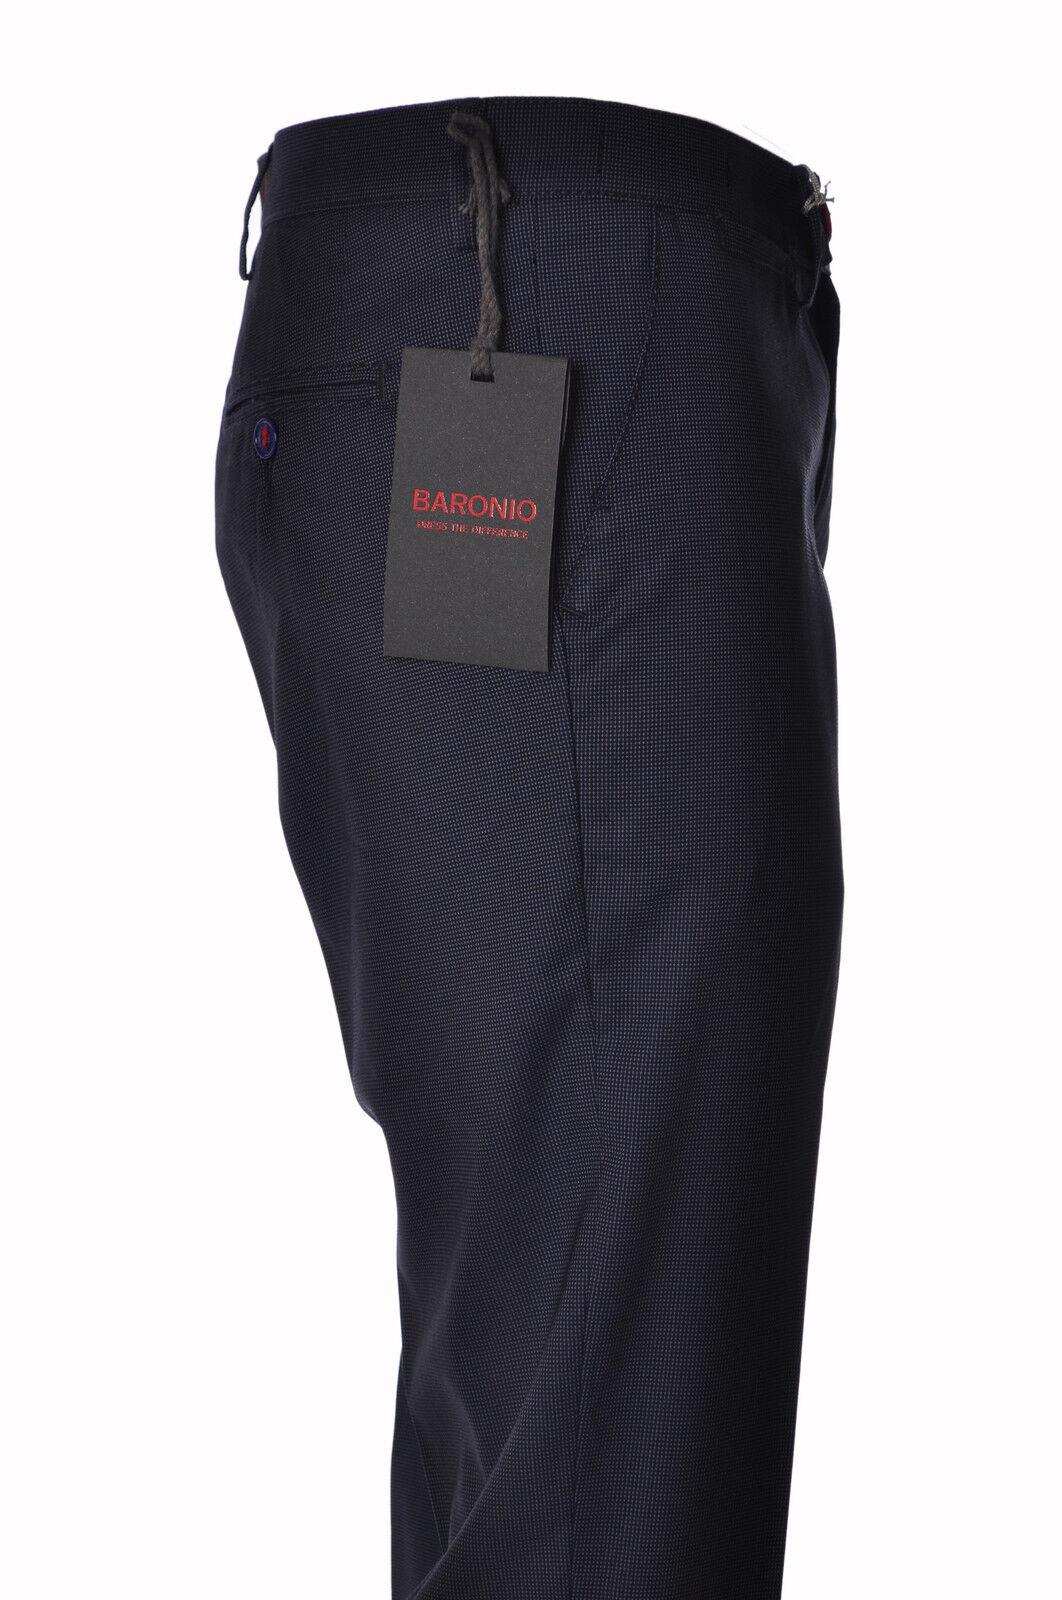 Baronio - Pants-Pants - Man - bluee - 3225006C195619